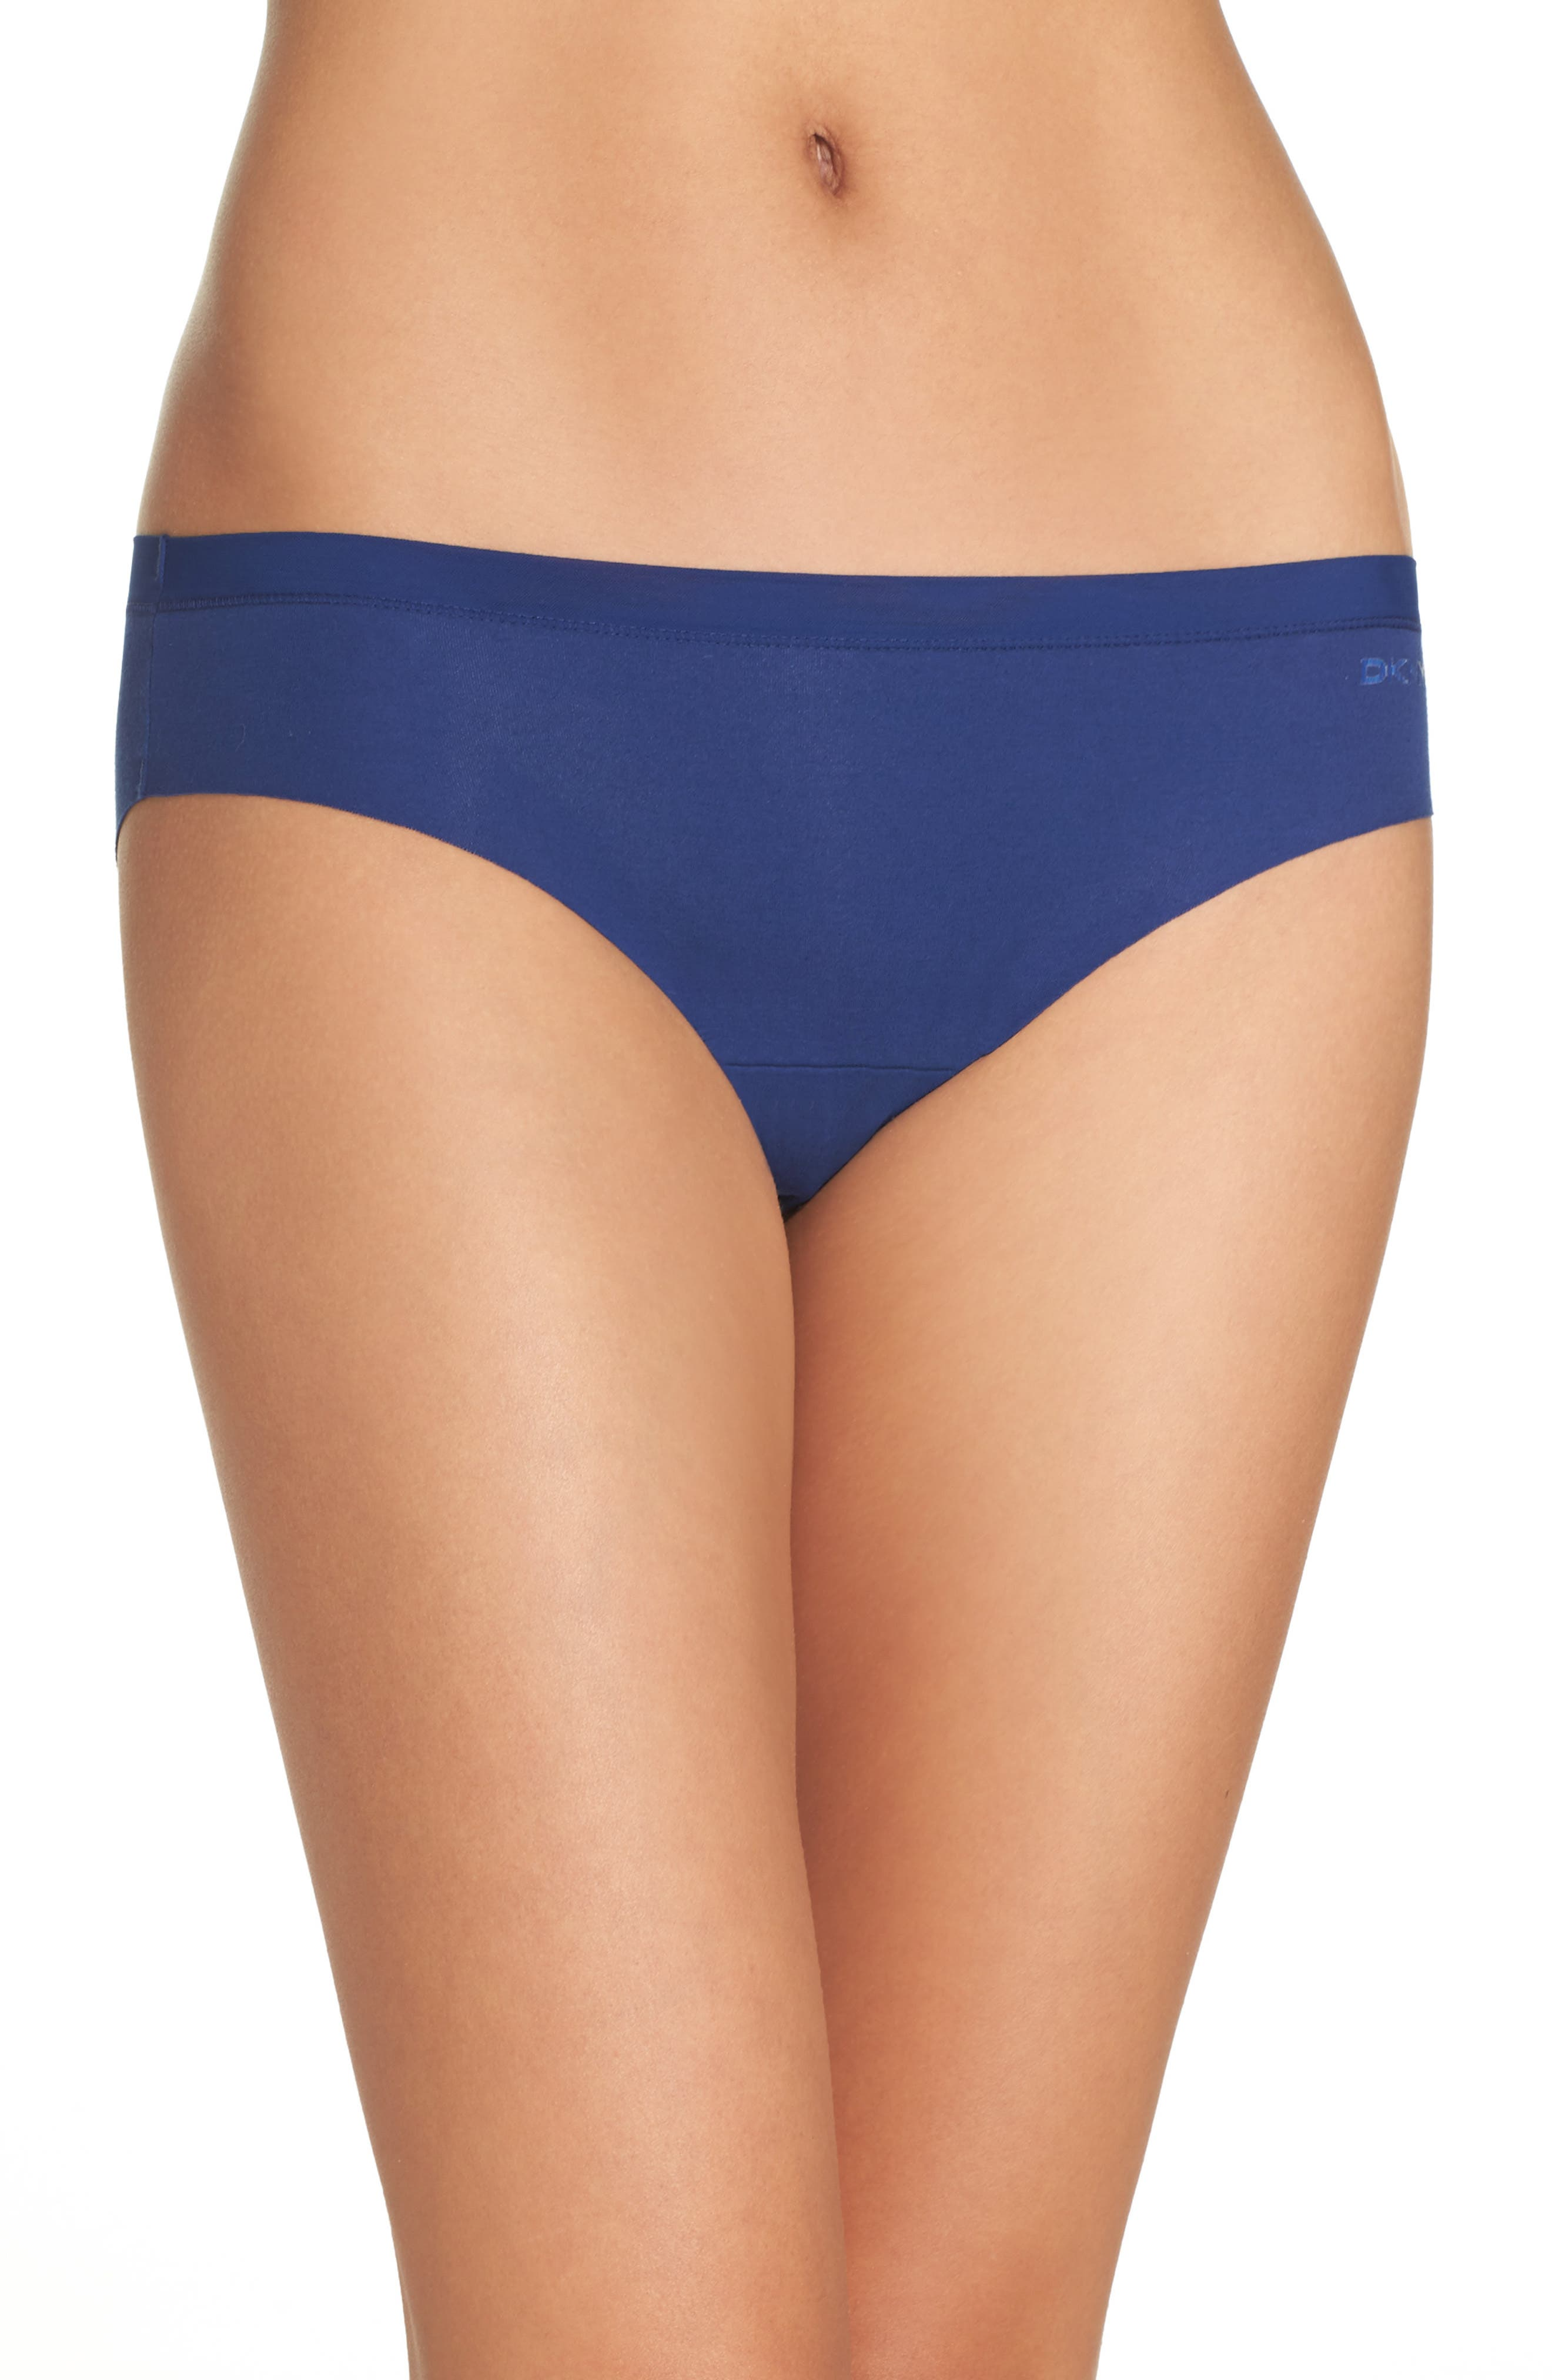 DKNY Seamless Bikini (4 for $30)